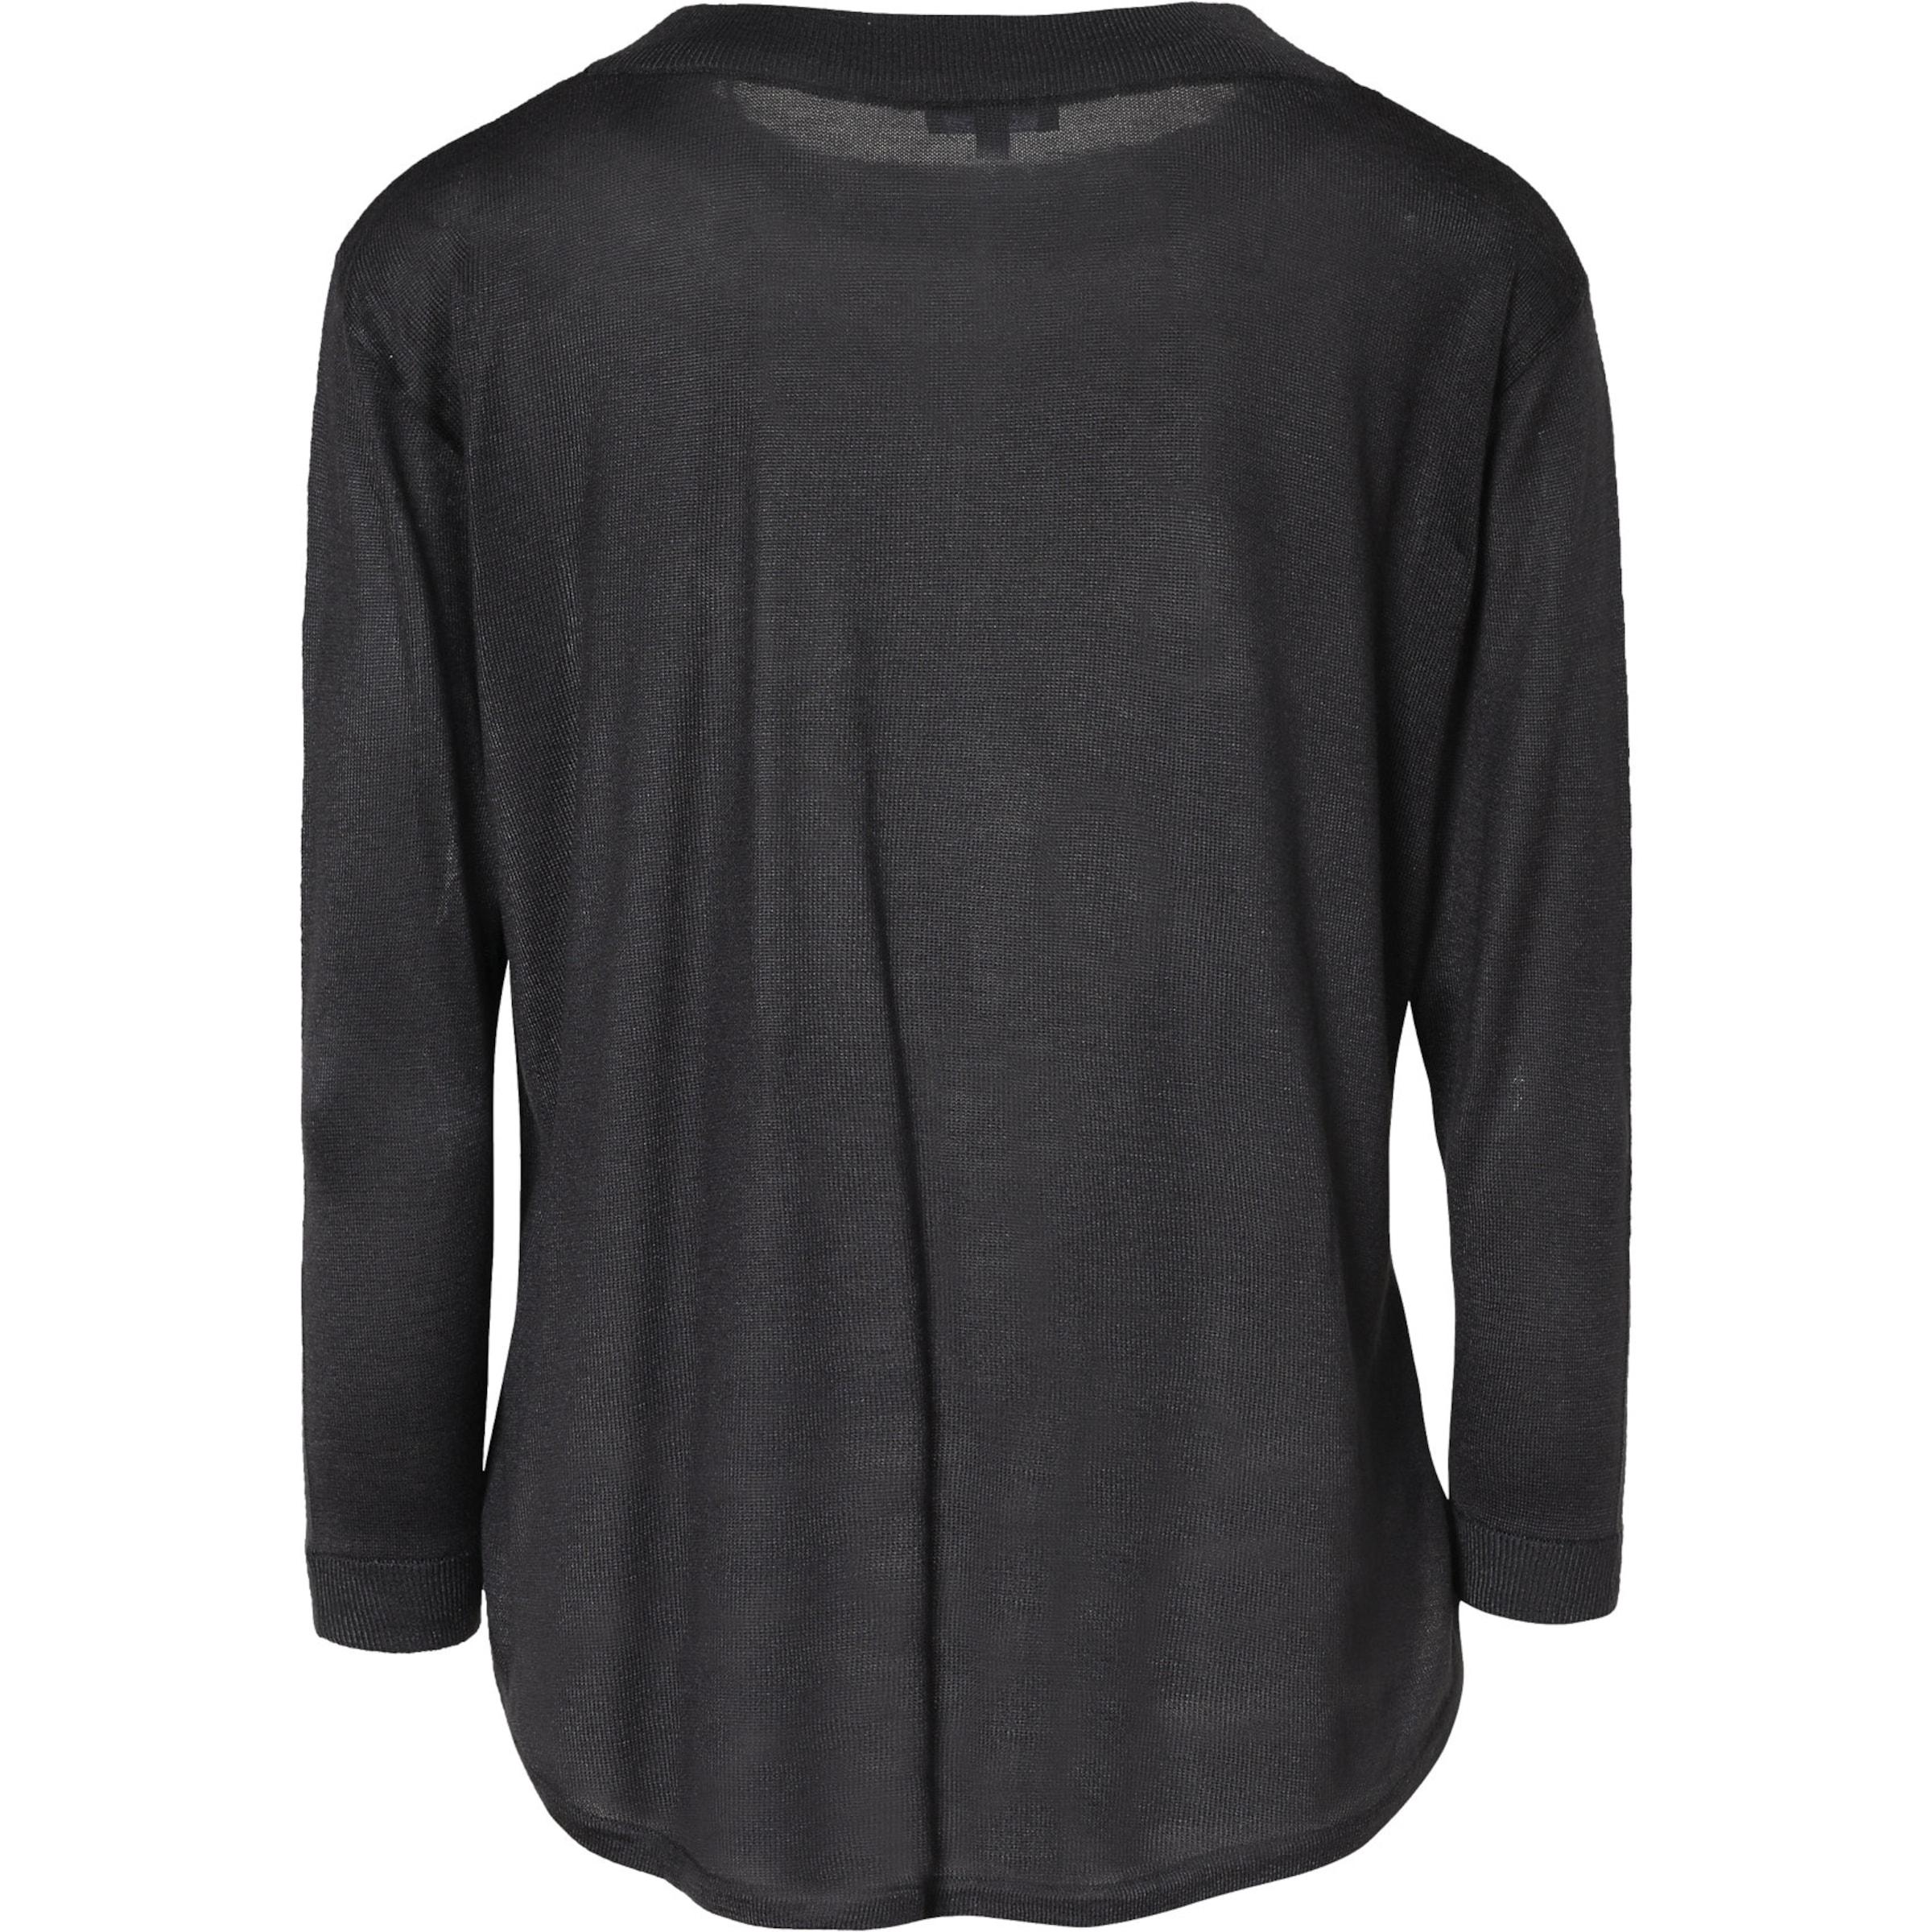 Tailor Pullover Pullover In Tom Tom Dunkelgrau Tailor In Tom Dunkelgrau dChQstr